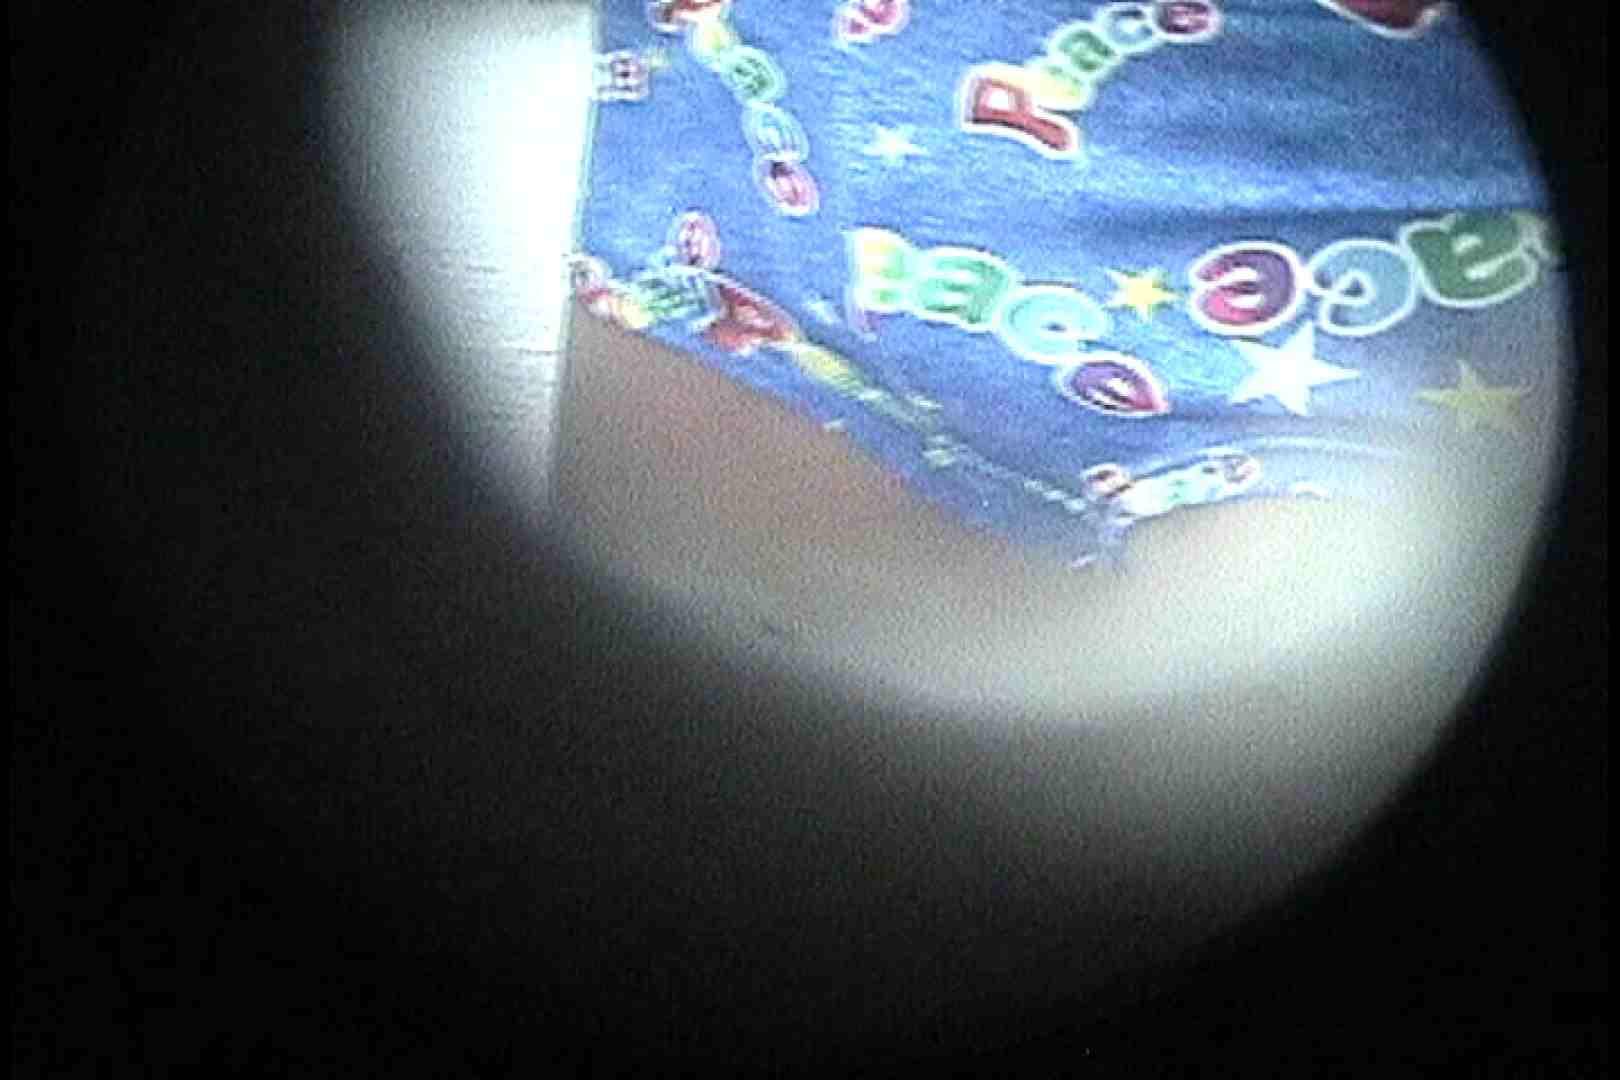 No.22 日焼け跡とオッパイの関係がおかしな貧乳ギャル 日焼け  89PICs 44